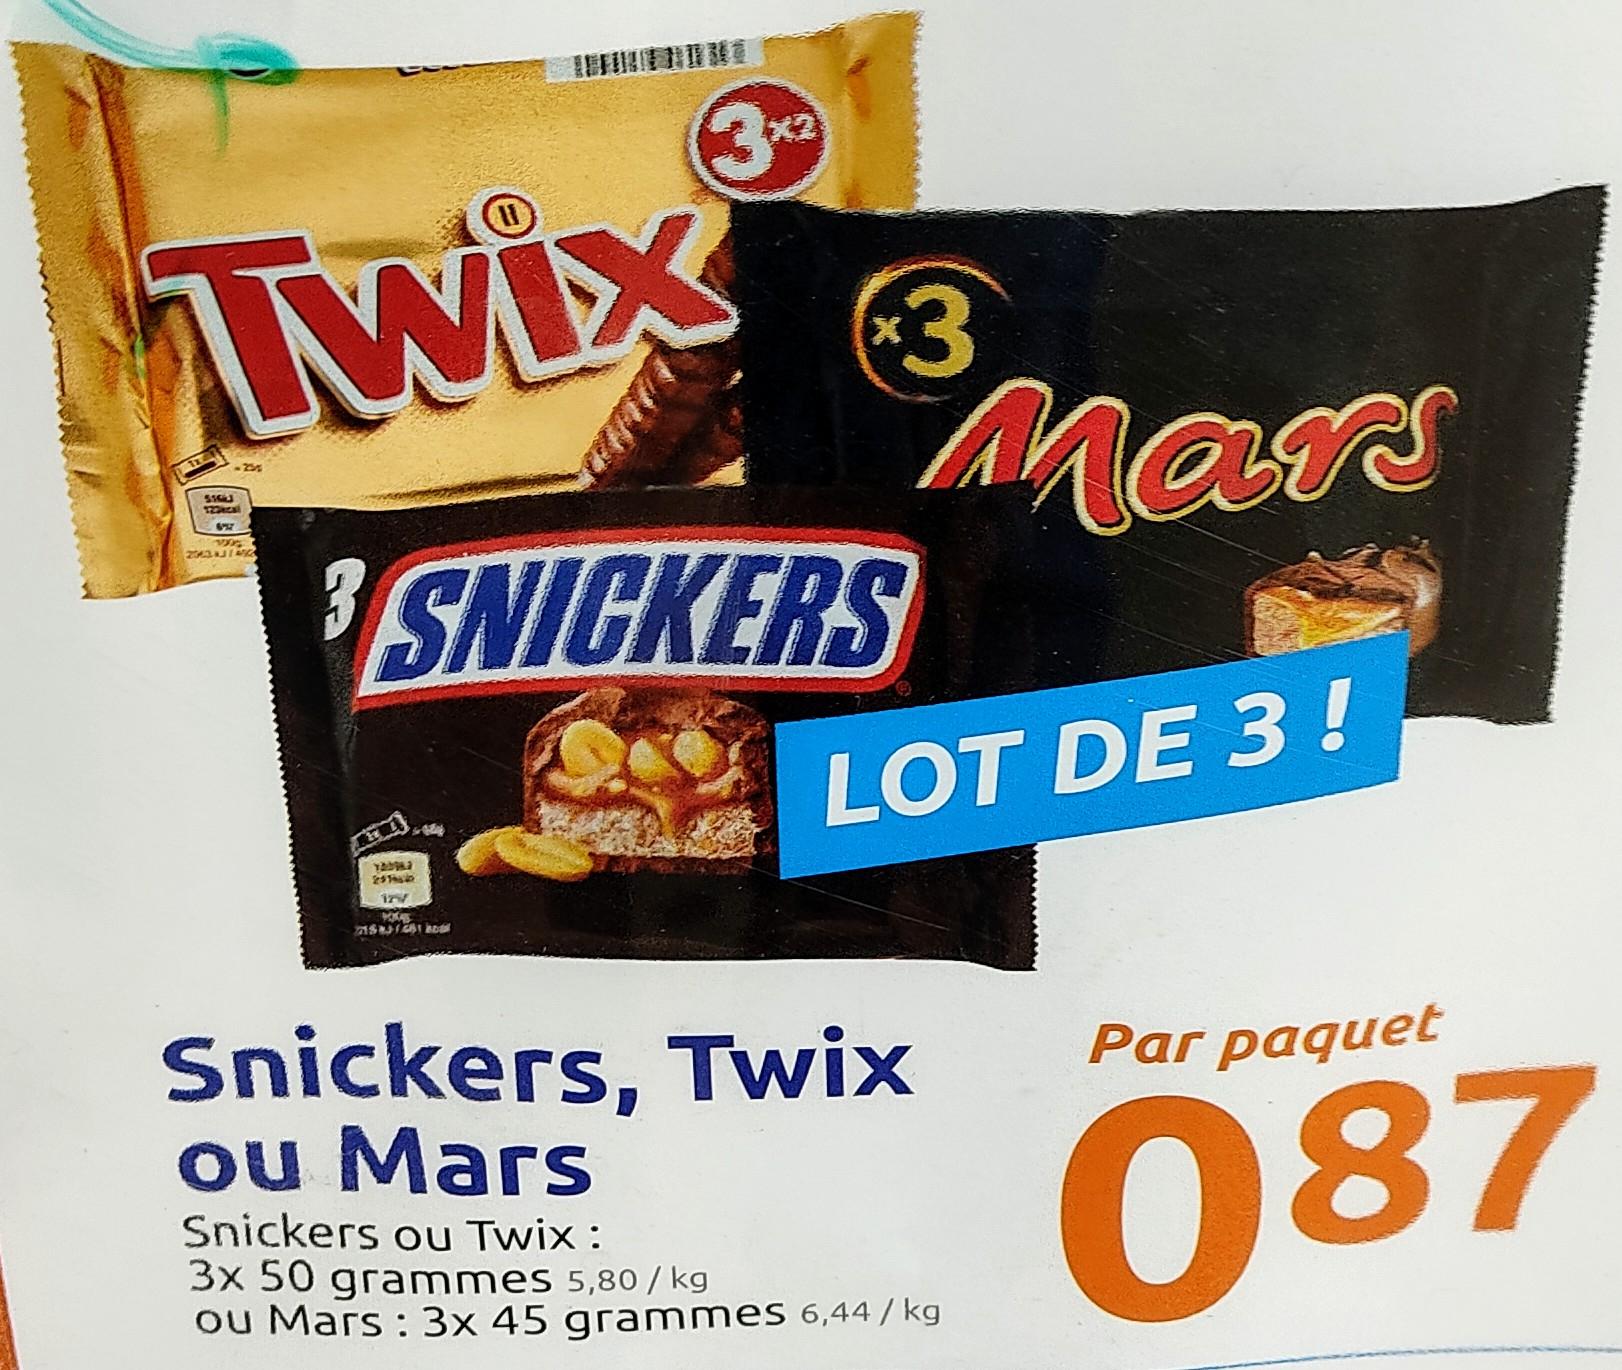 Pack de 3 barres Snickers, Twix ou Mars